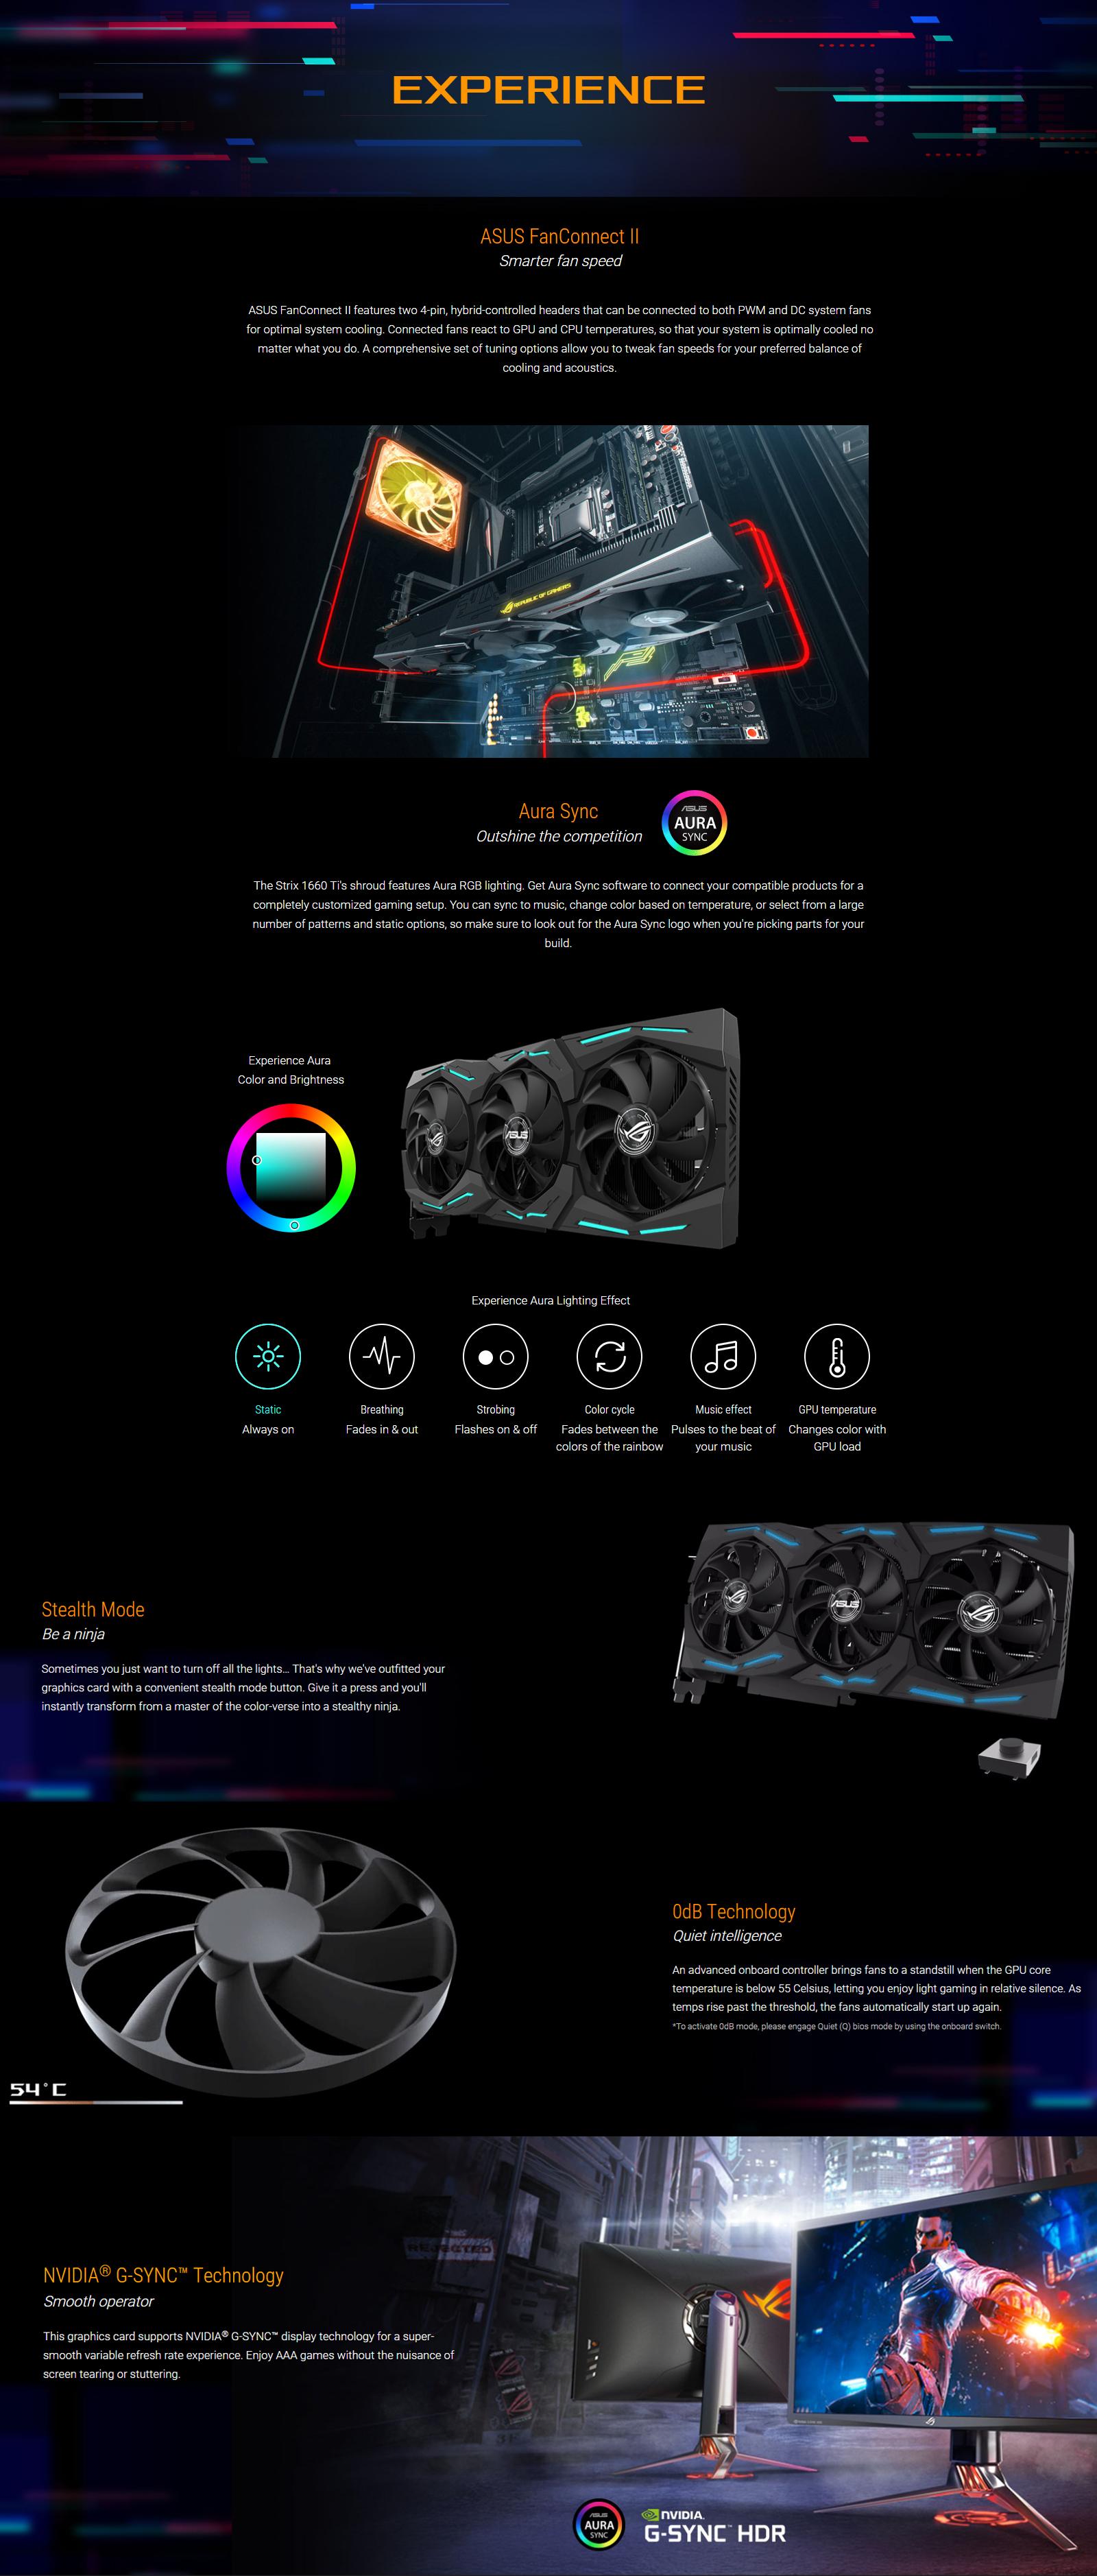 Asus GeForce GTX 1660 Ti ROG Strix Gaming 6G OC Graphics Card